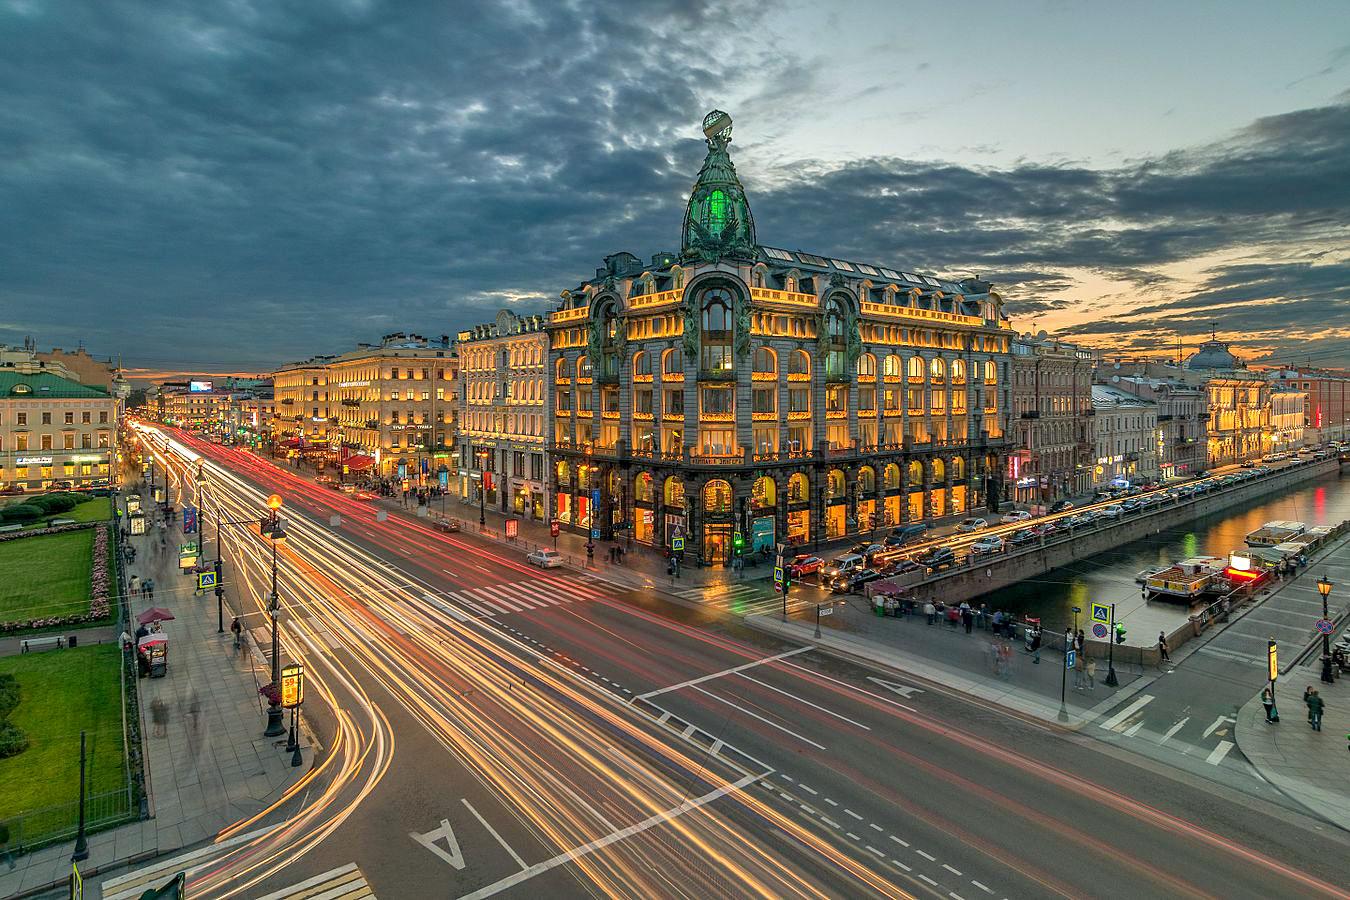 https://timetraveling.ru/images/saint-petersburg/3days/nevskii1.jpg